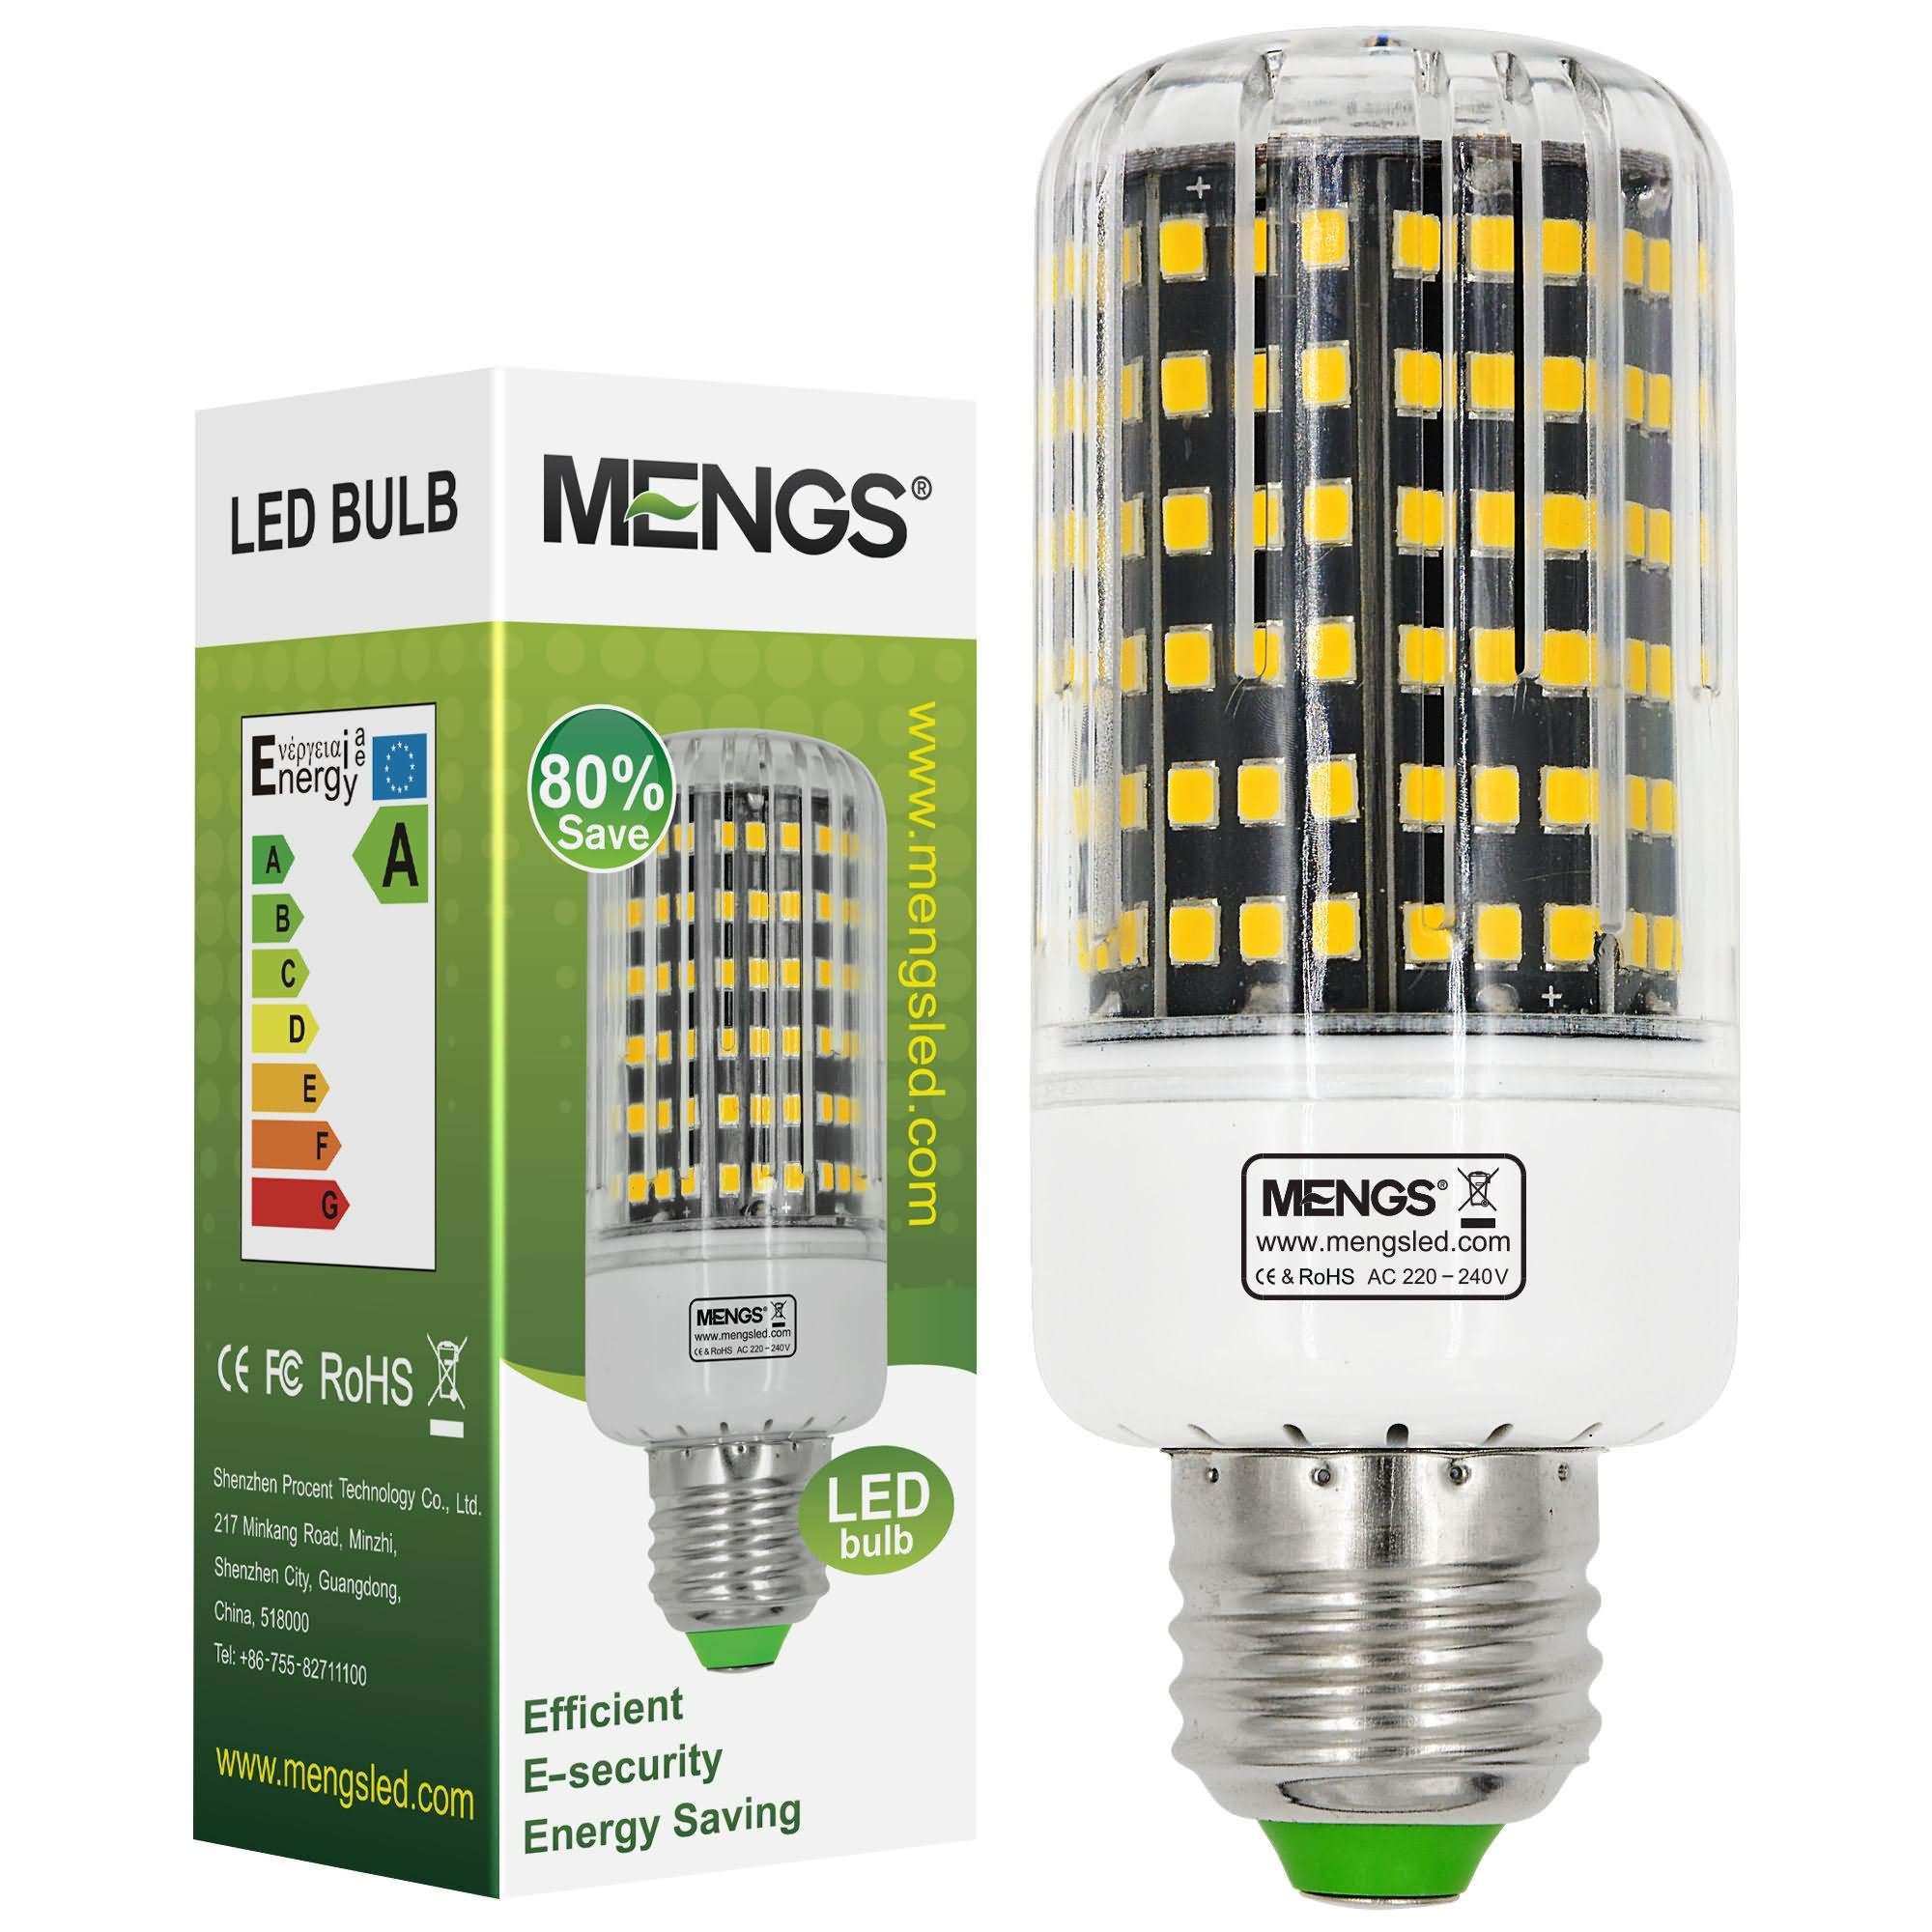 MENGS® E27 15W LED Corn Light 162x 2835 SMD LED Bulb Lamp With Aluminum Plate In Warm White Energy-Saving Light